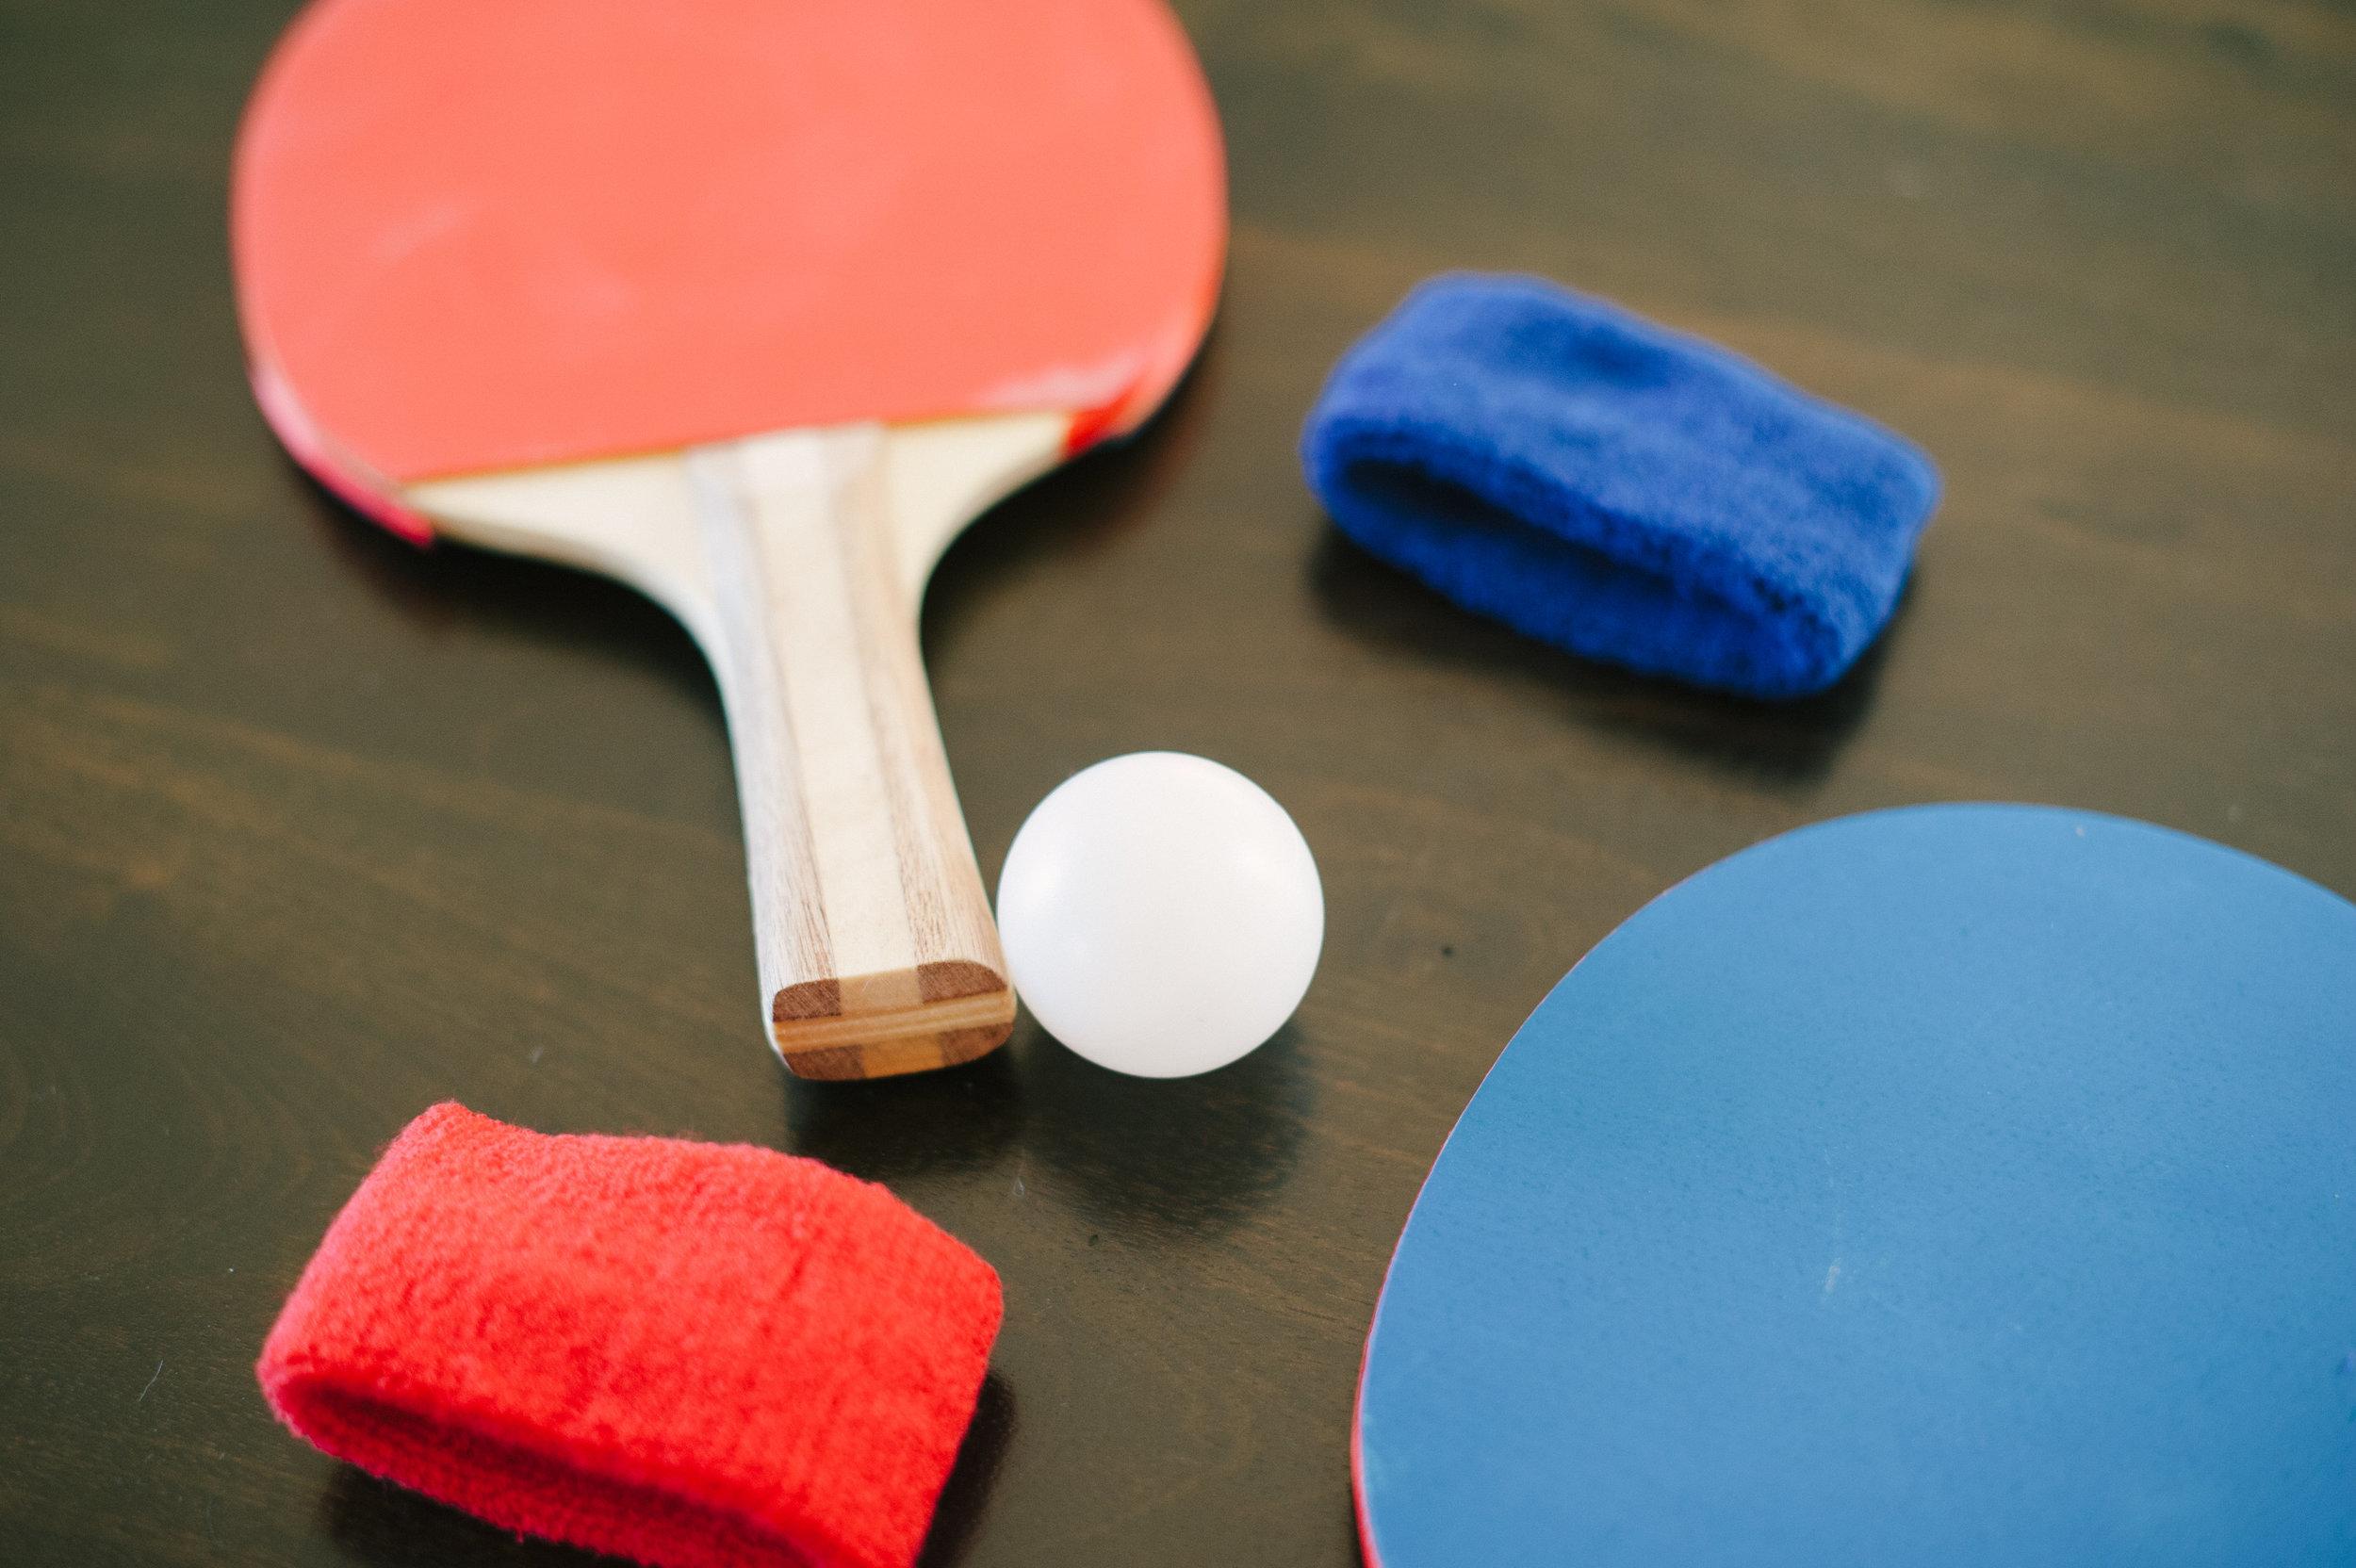 RedEnvelope Dining Table Tennis